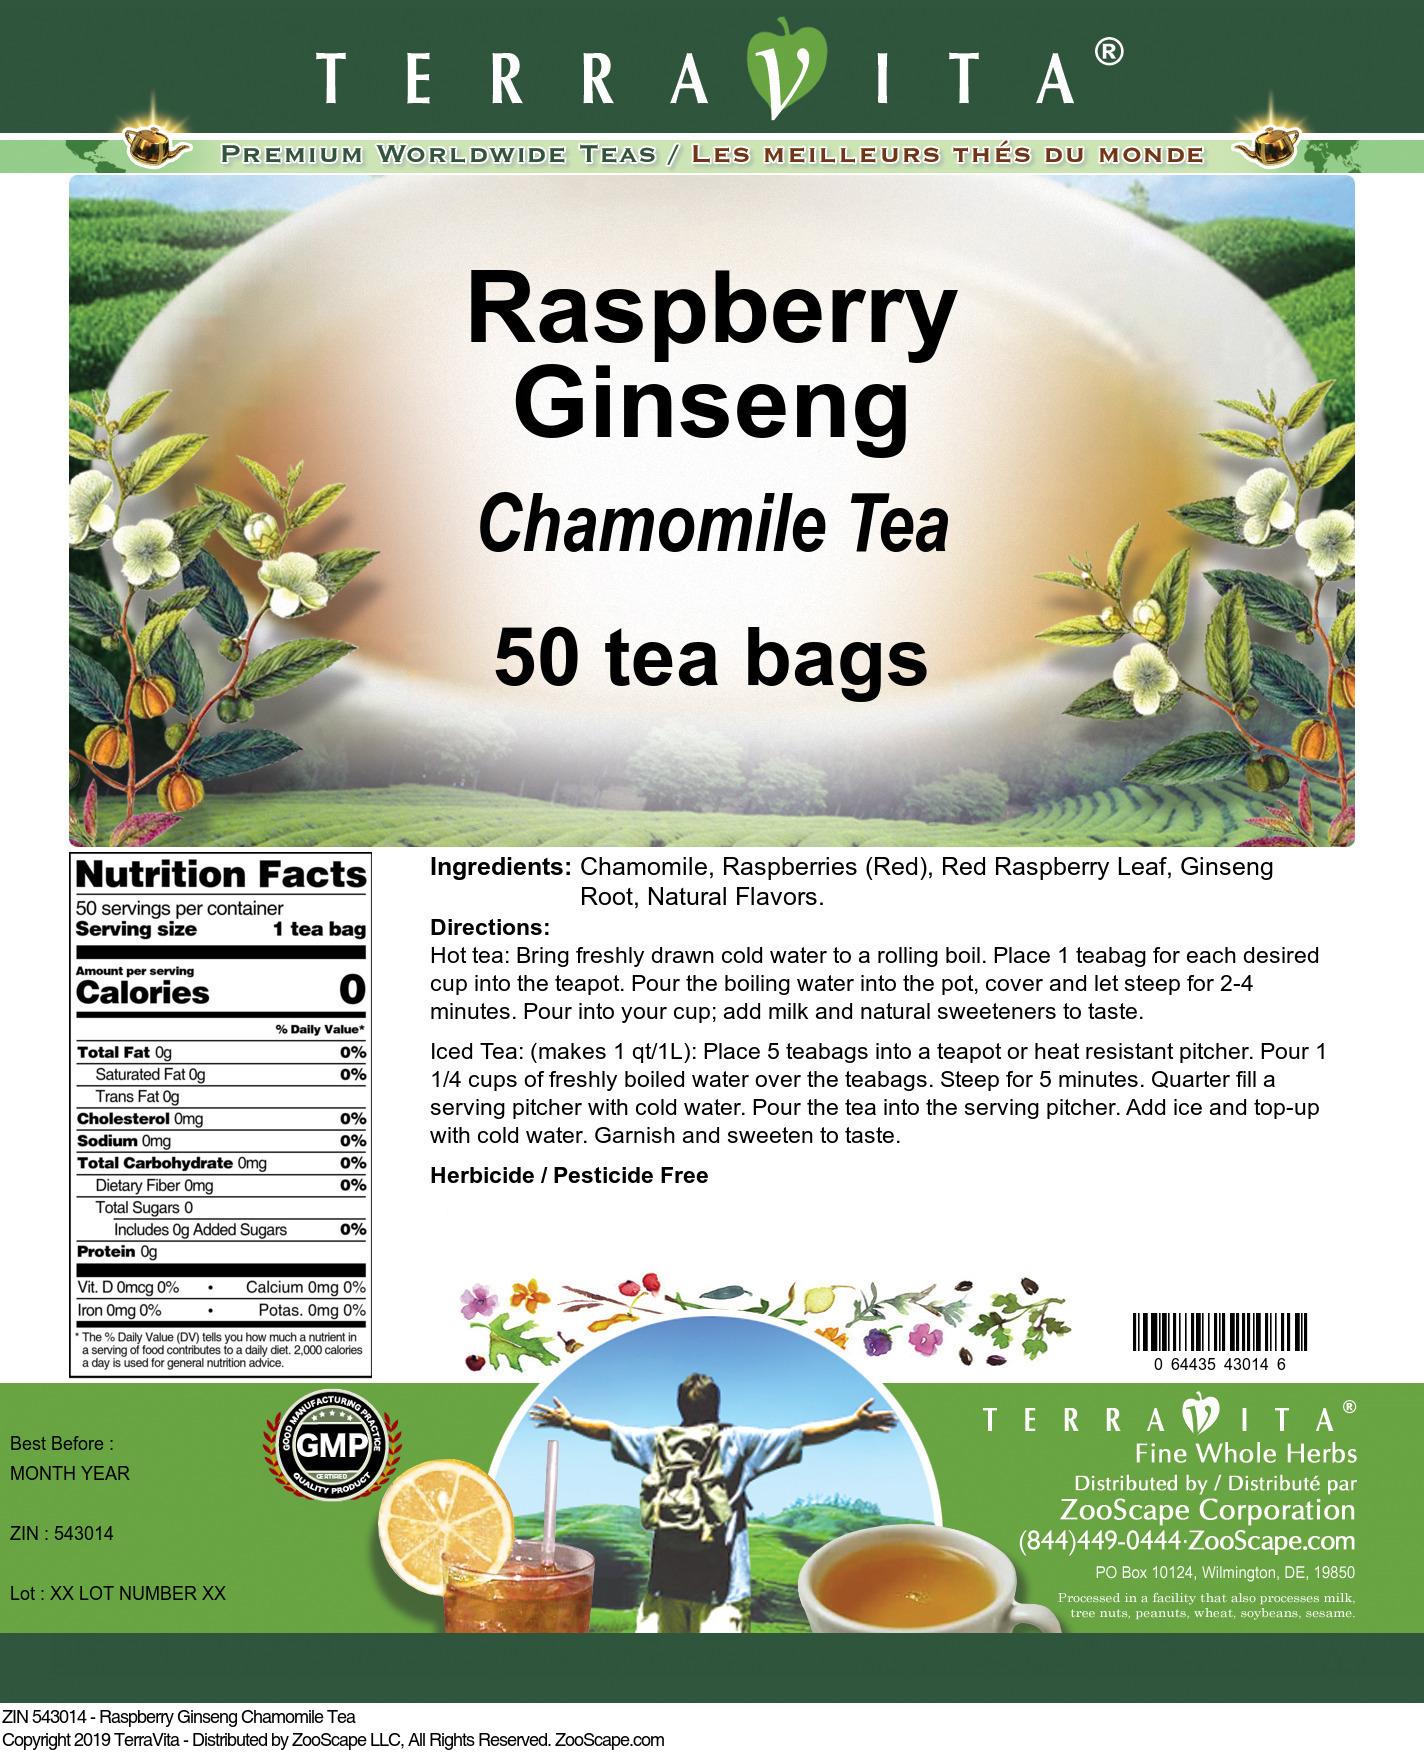 Raspberry Ginseng Chamomile Tea